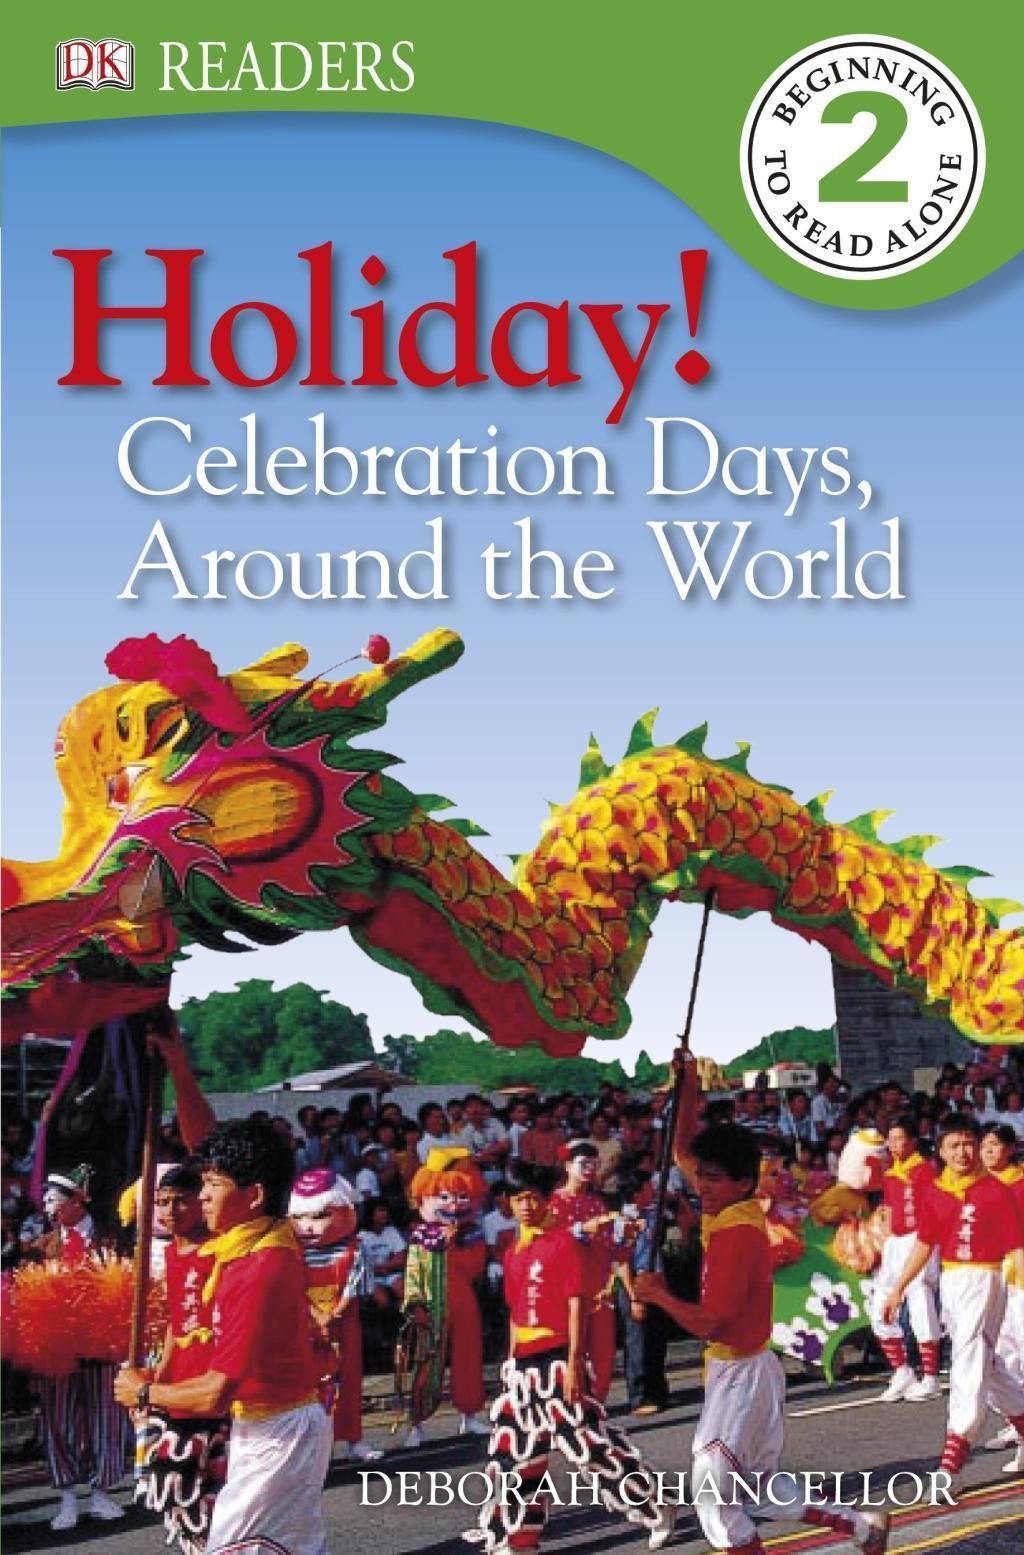 Holiday! Celebration Days around the World